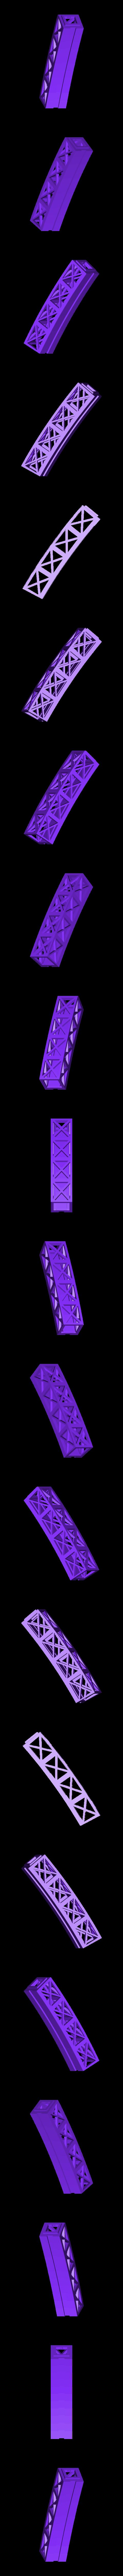 SEG_E-3.stl Download free STL file LED bridge lamp • Model to 3D print, Opossums